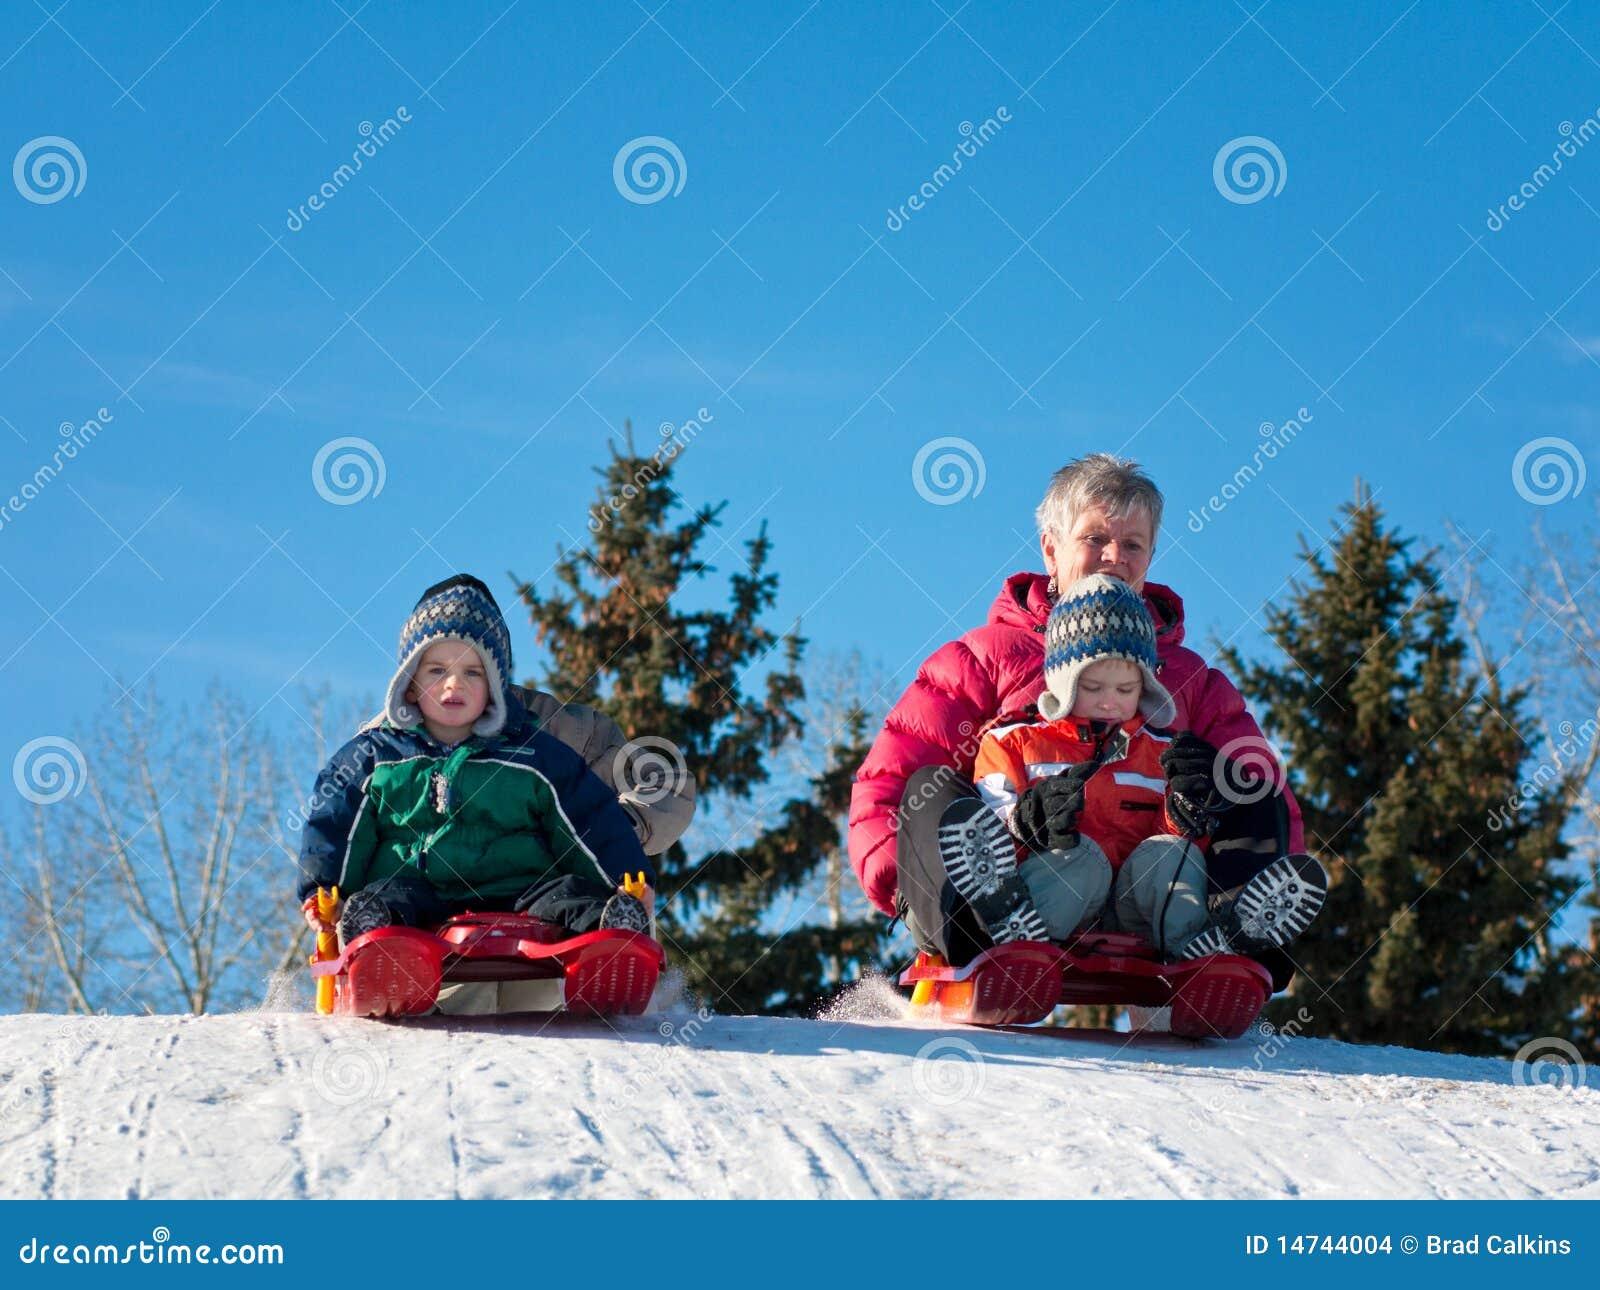 Familia sledding